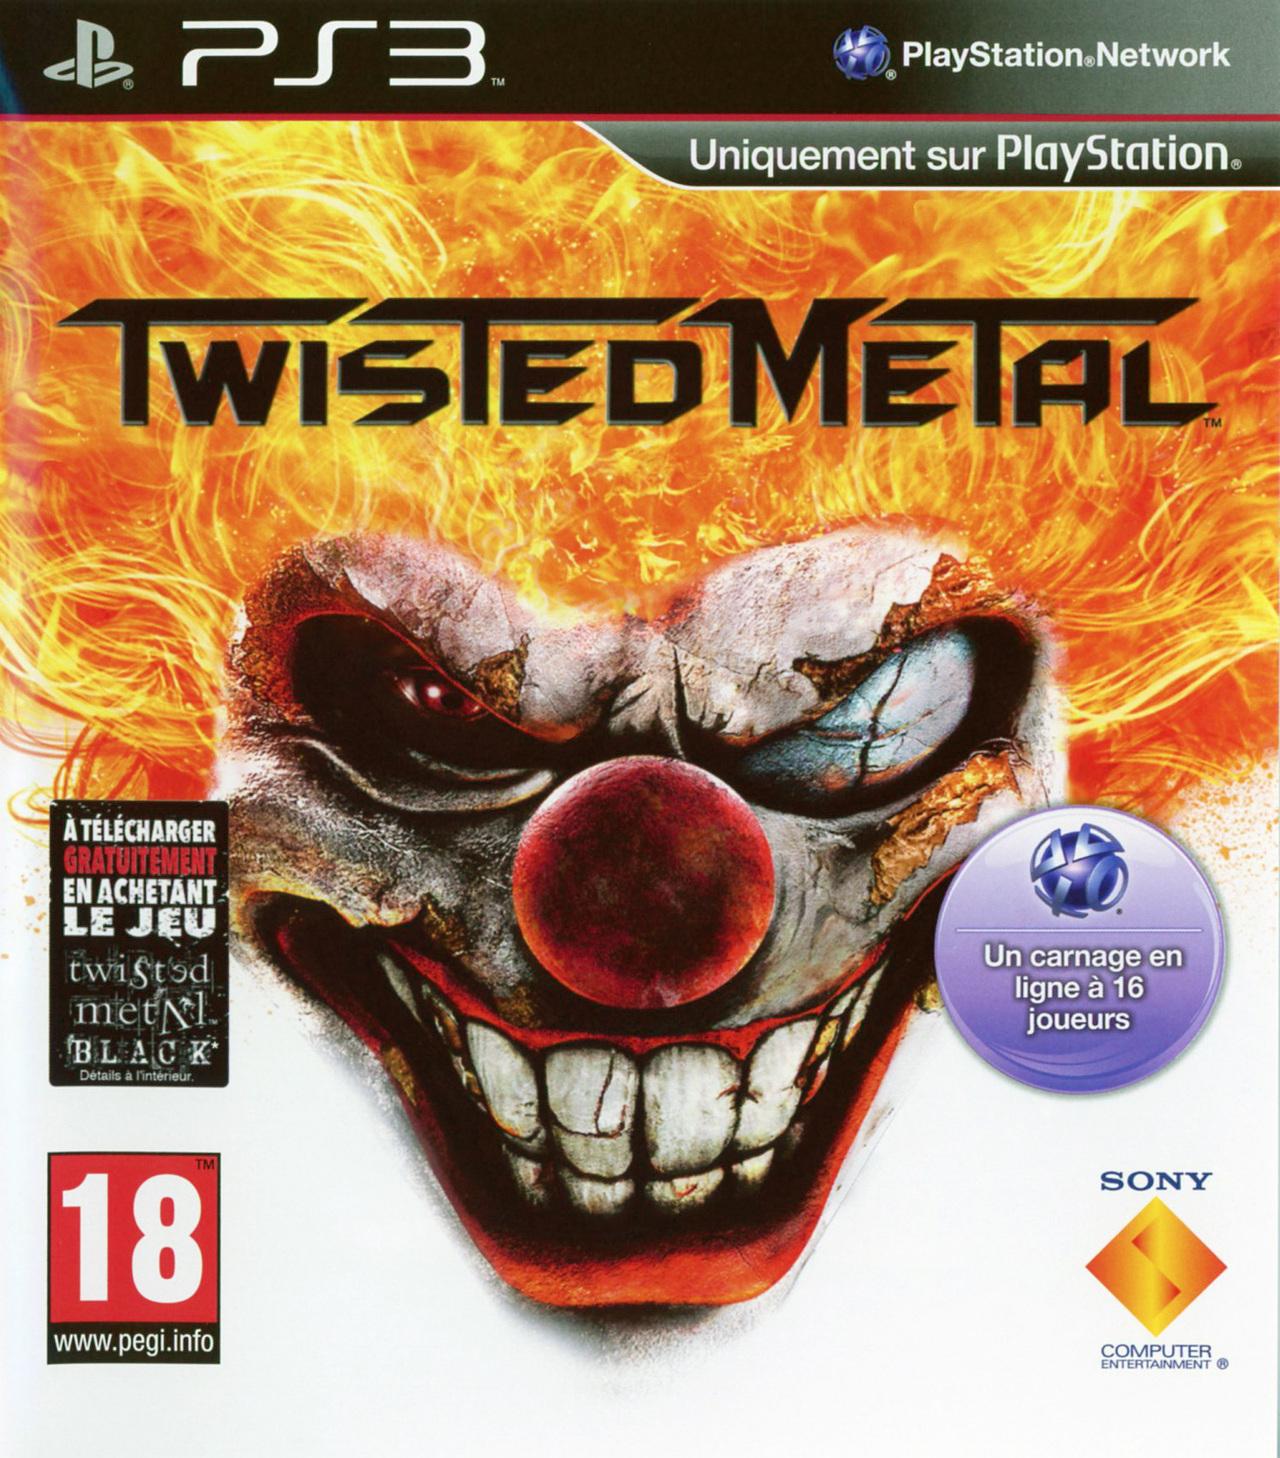 Twisted Metal sur PlayStation 3 - jeuxvideo.com